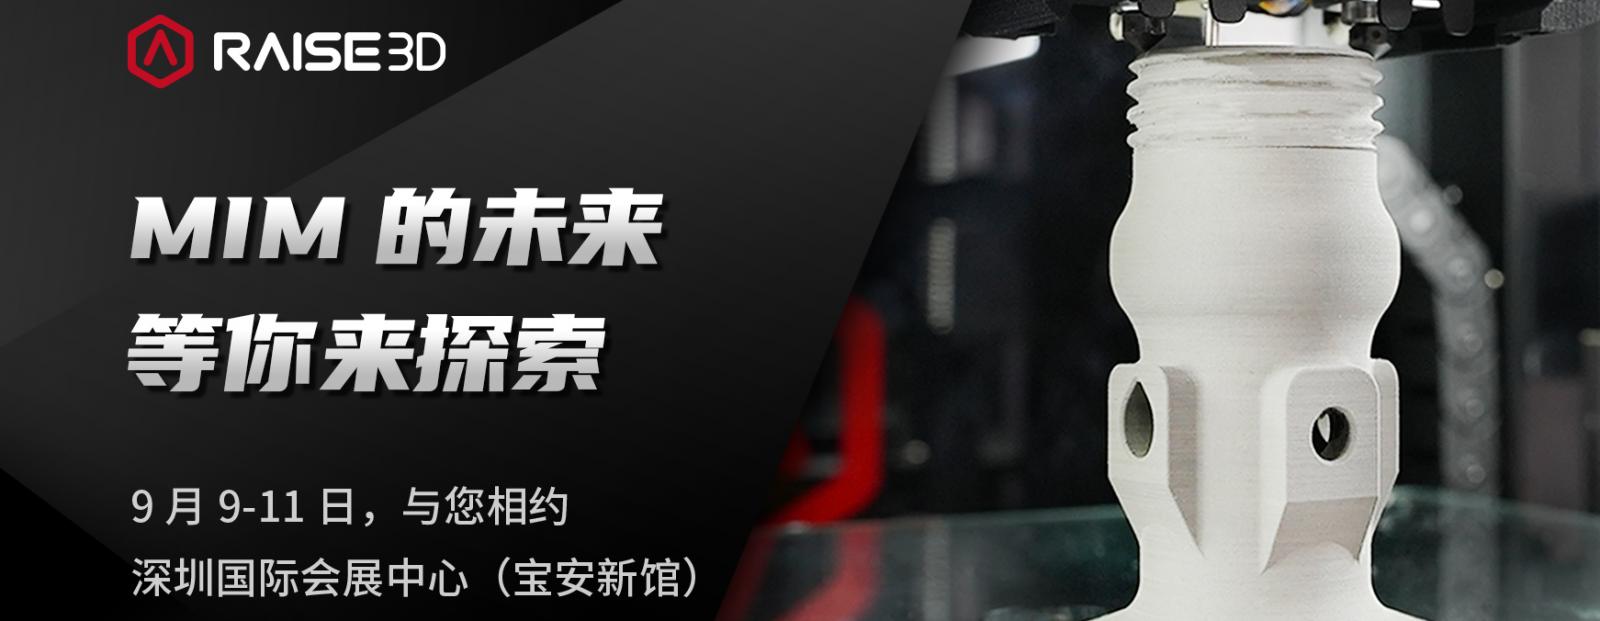 formnext深圳展开幕在即:Raise3D将有哪些精彩亮点?